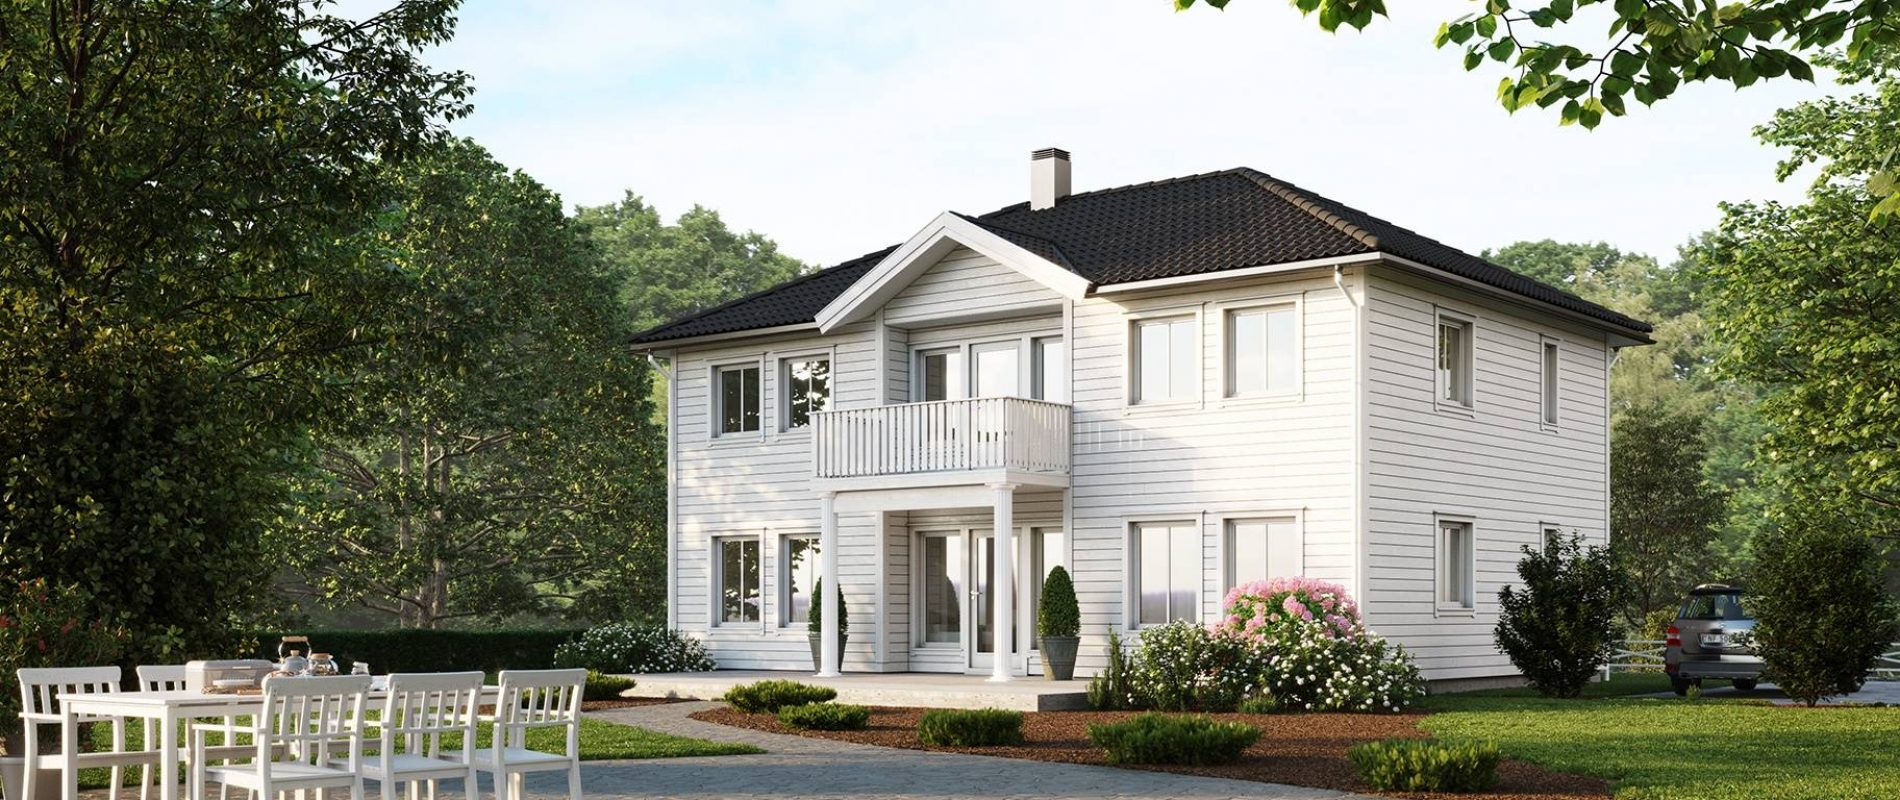 Systemhus_Ekeberg_herskapelig_villa